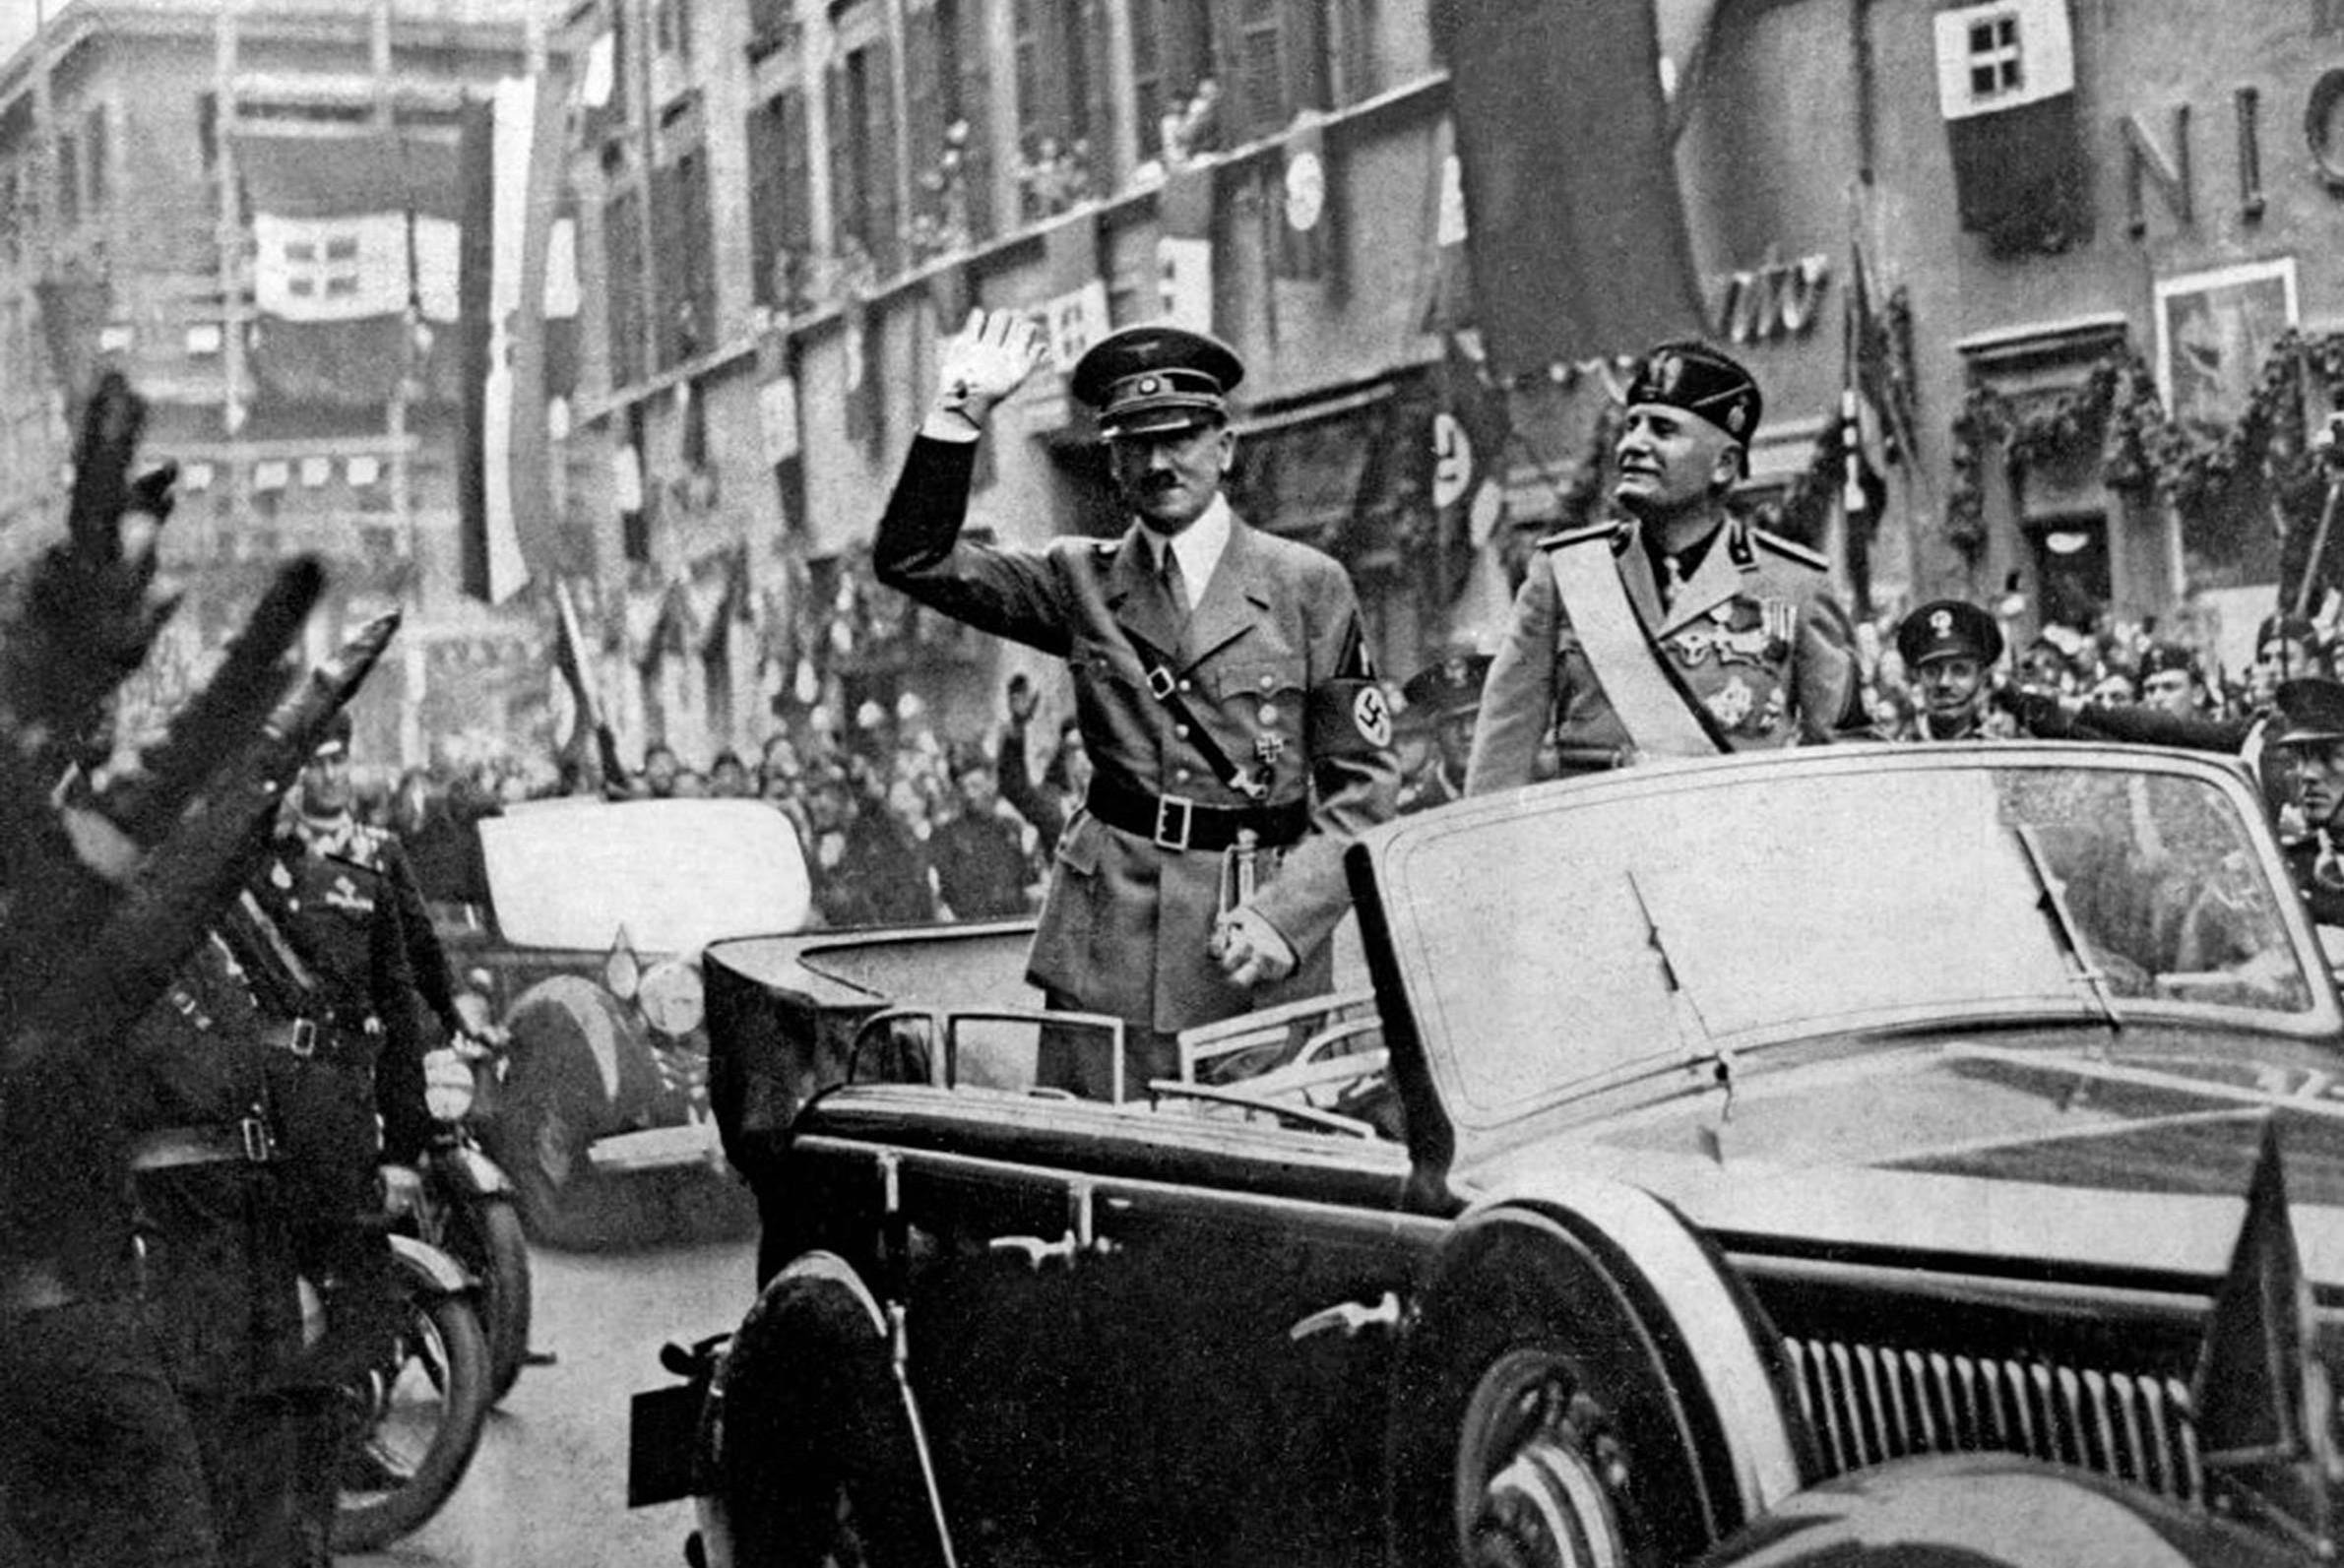 Adolf Hitler i Benito Musolini u automobilu salutiraju okupljenoj masi ljudi, Rim, maj 1938. (Foto: Mondadori Portfolio/Getty Images)